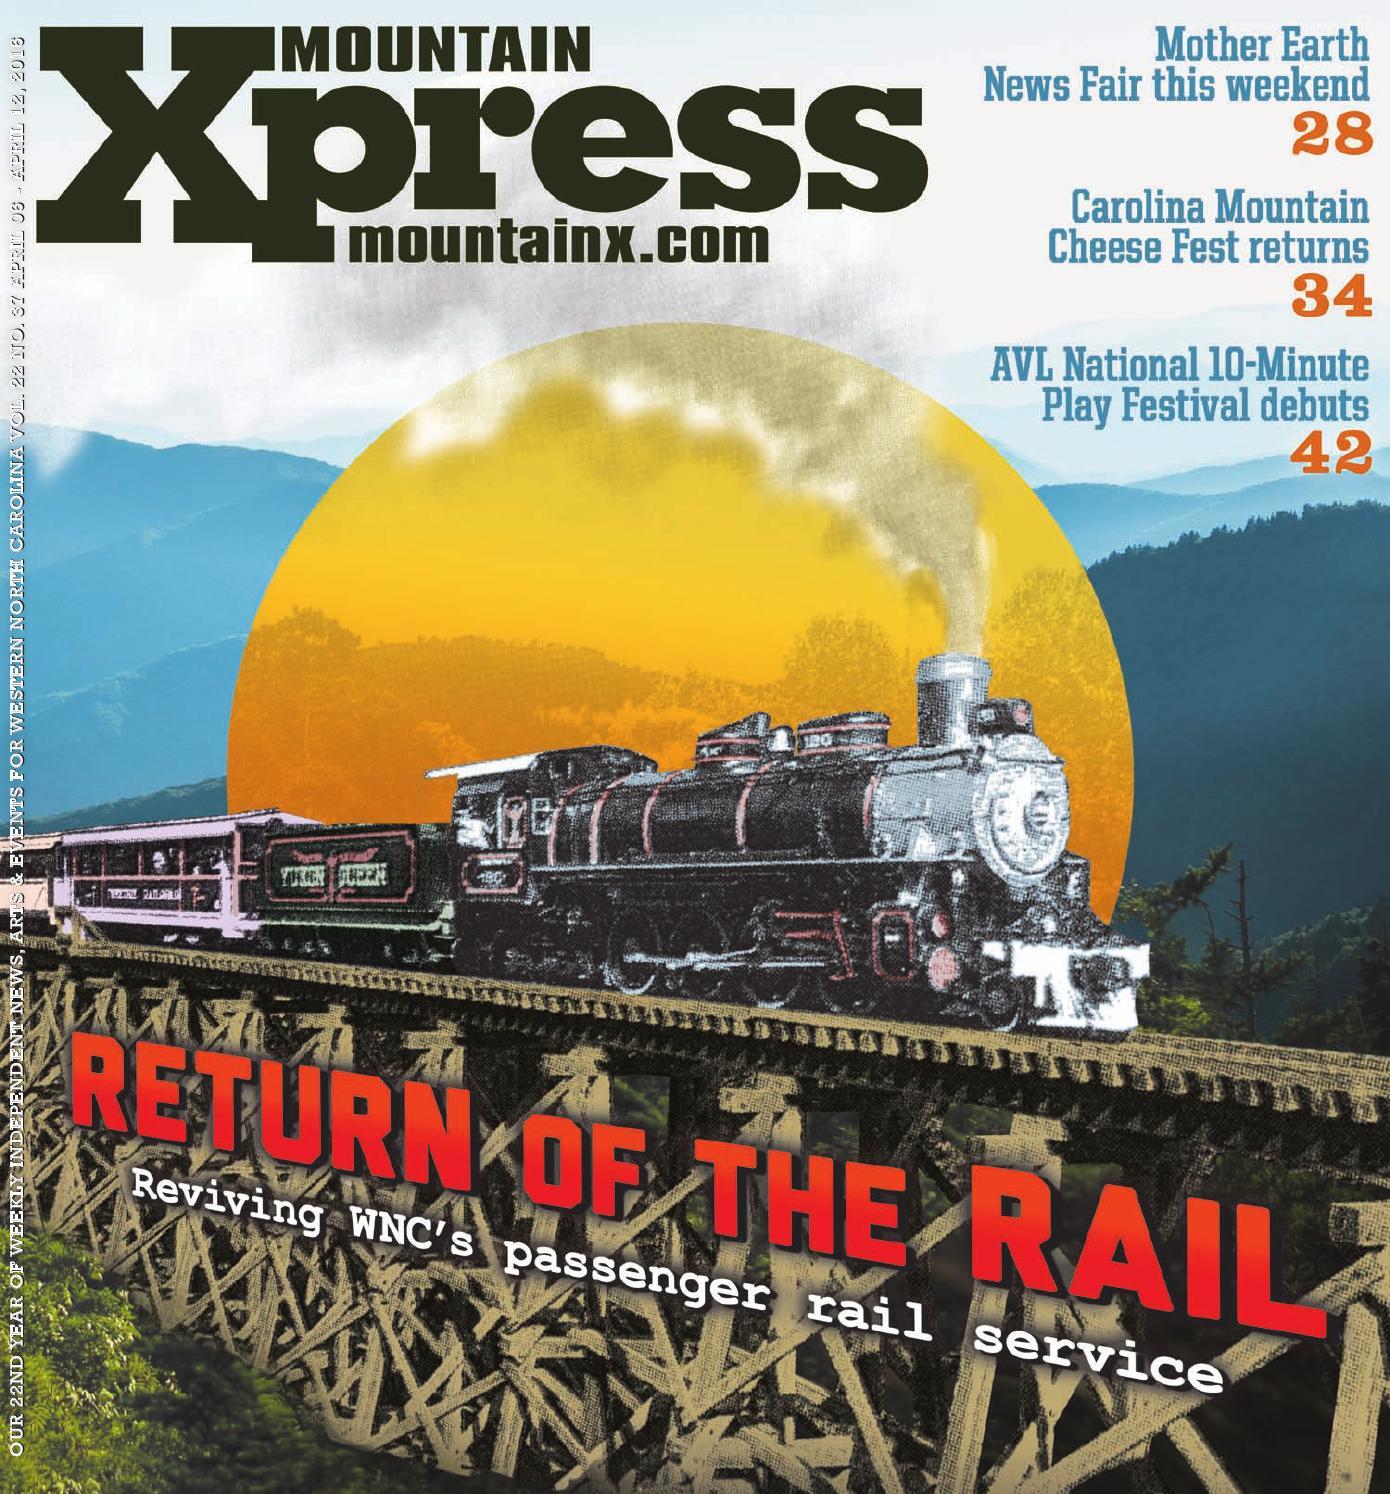 Mountain Xpress 04 06 16 by Mountain Xpress - issuu